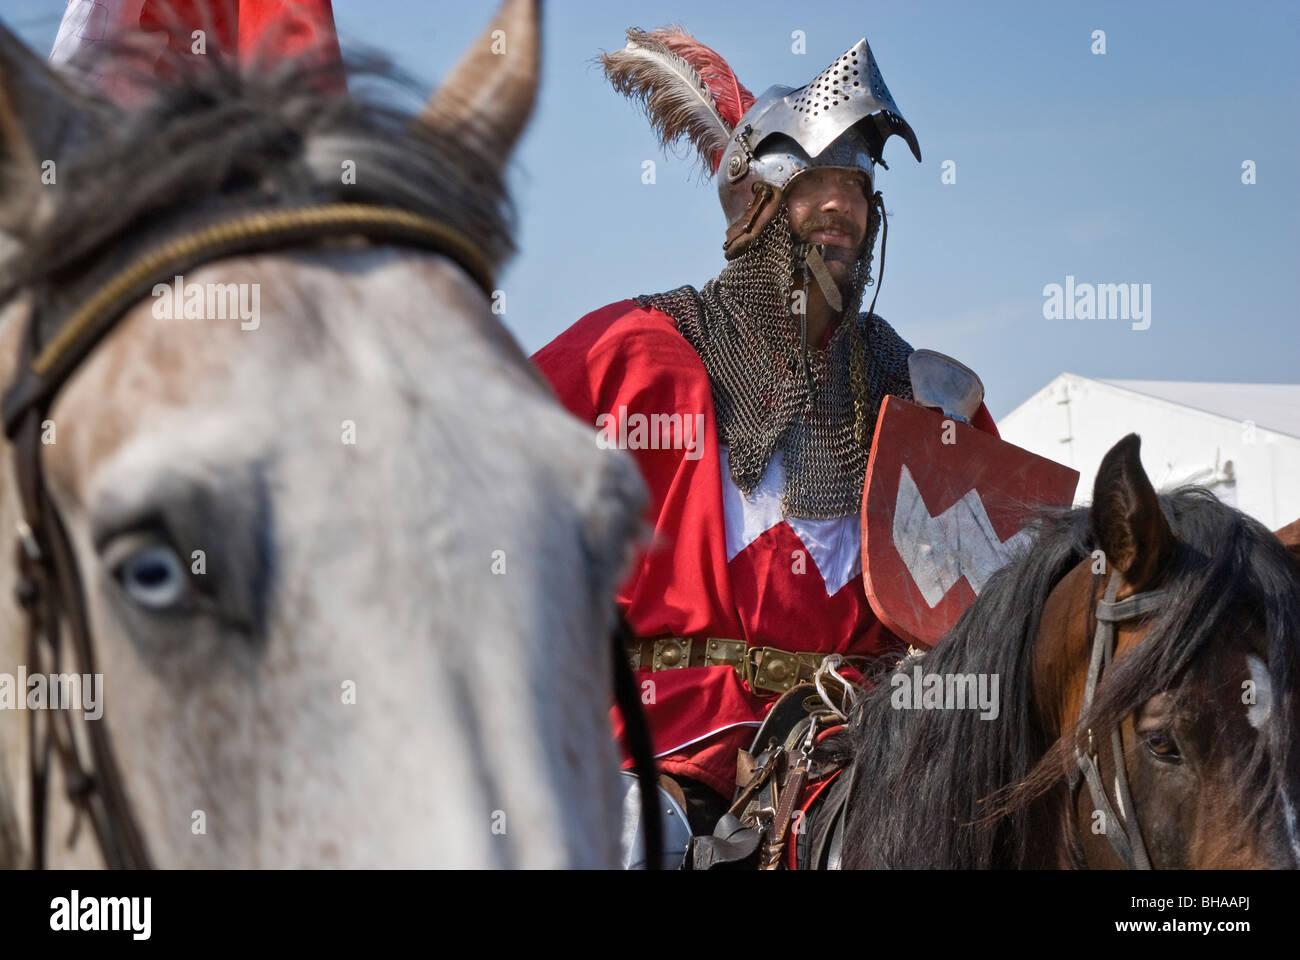 Sword-bearer of Polish Crown leaving battleground after Battle of Grunwald of 1410 in Warminsko-Mazurskie province, - Stock Image